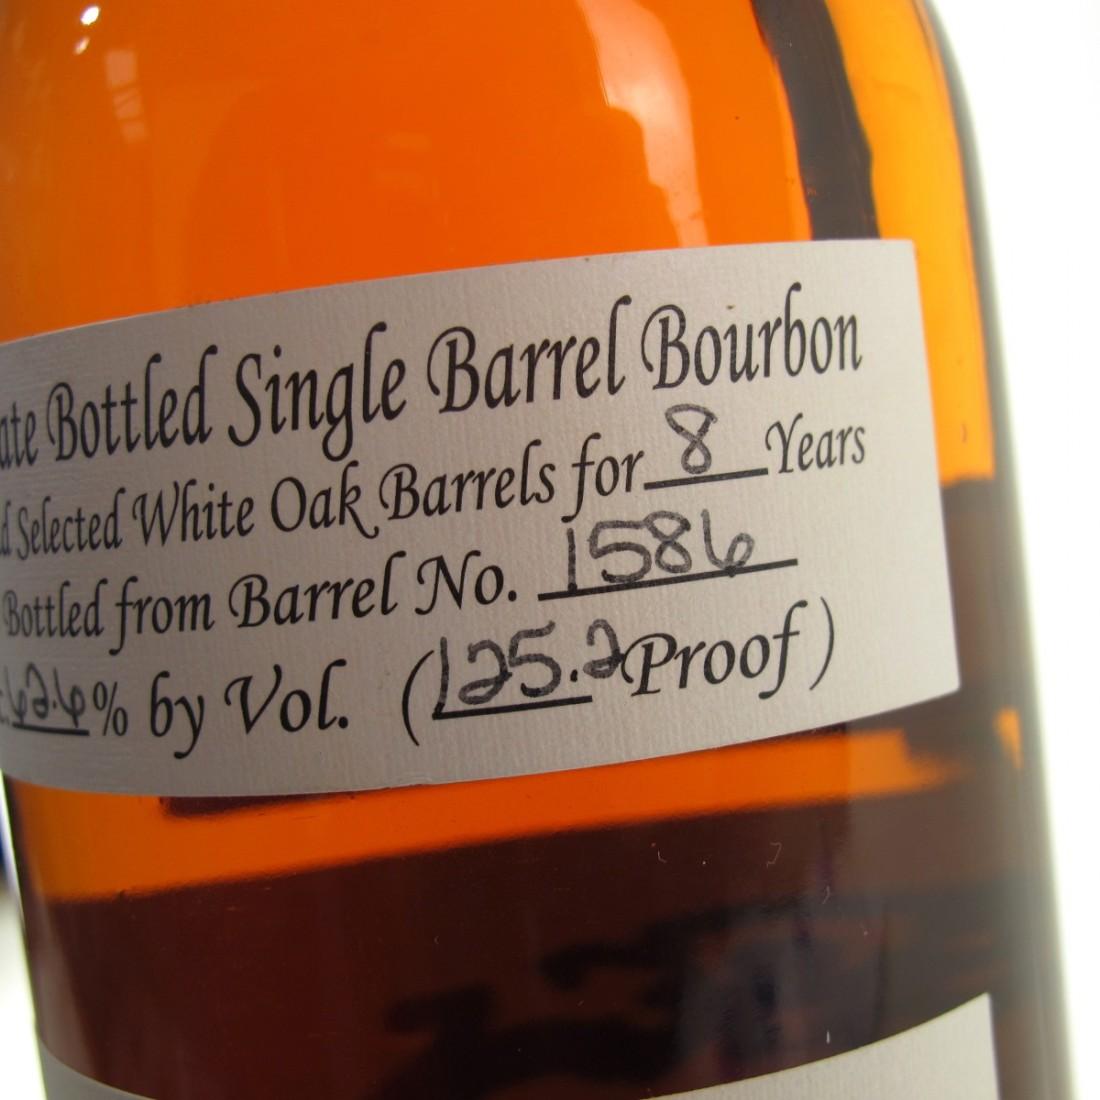 Willett Family Estate 8 Year Old Single Barrel Bourbon #1586 / Lion's Share Vol. 1